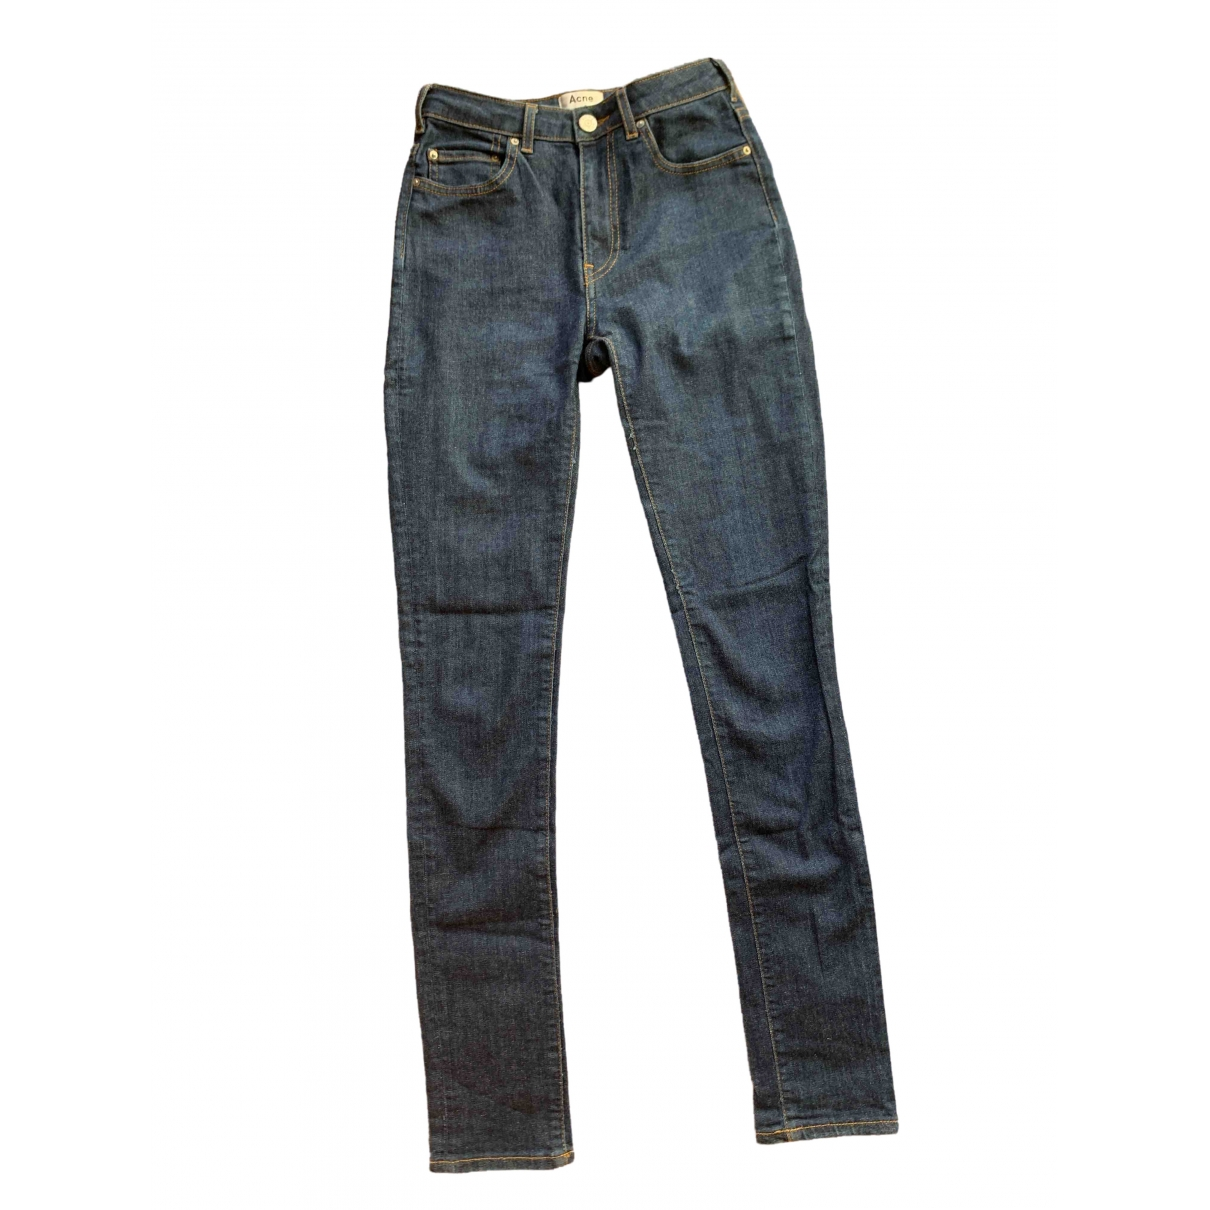 Acne Studios \N Blue Cotton - elasthane Jeans for Women 26 US